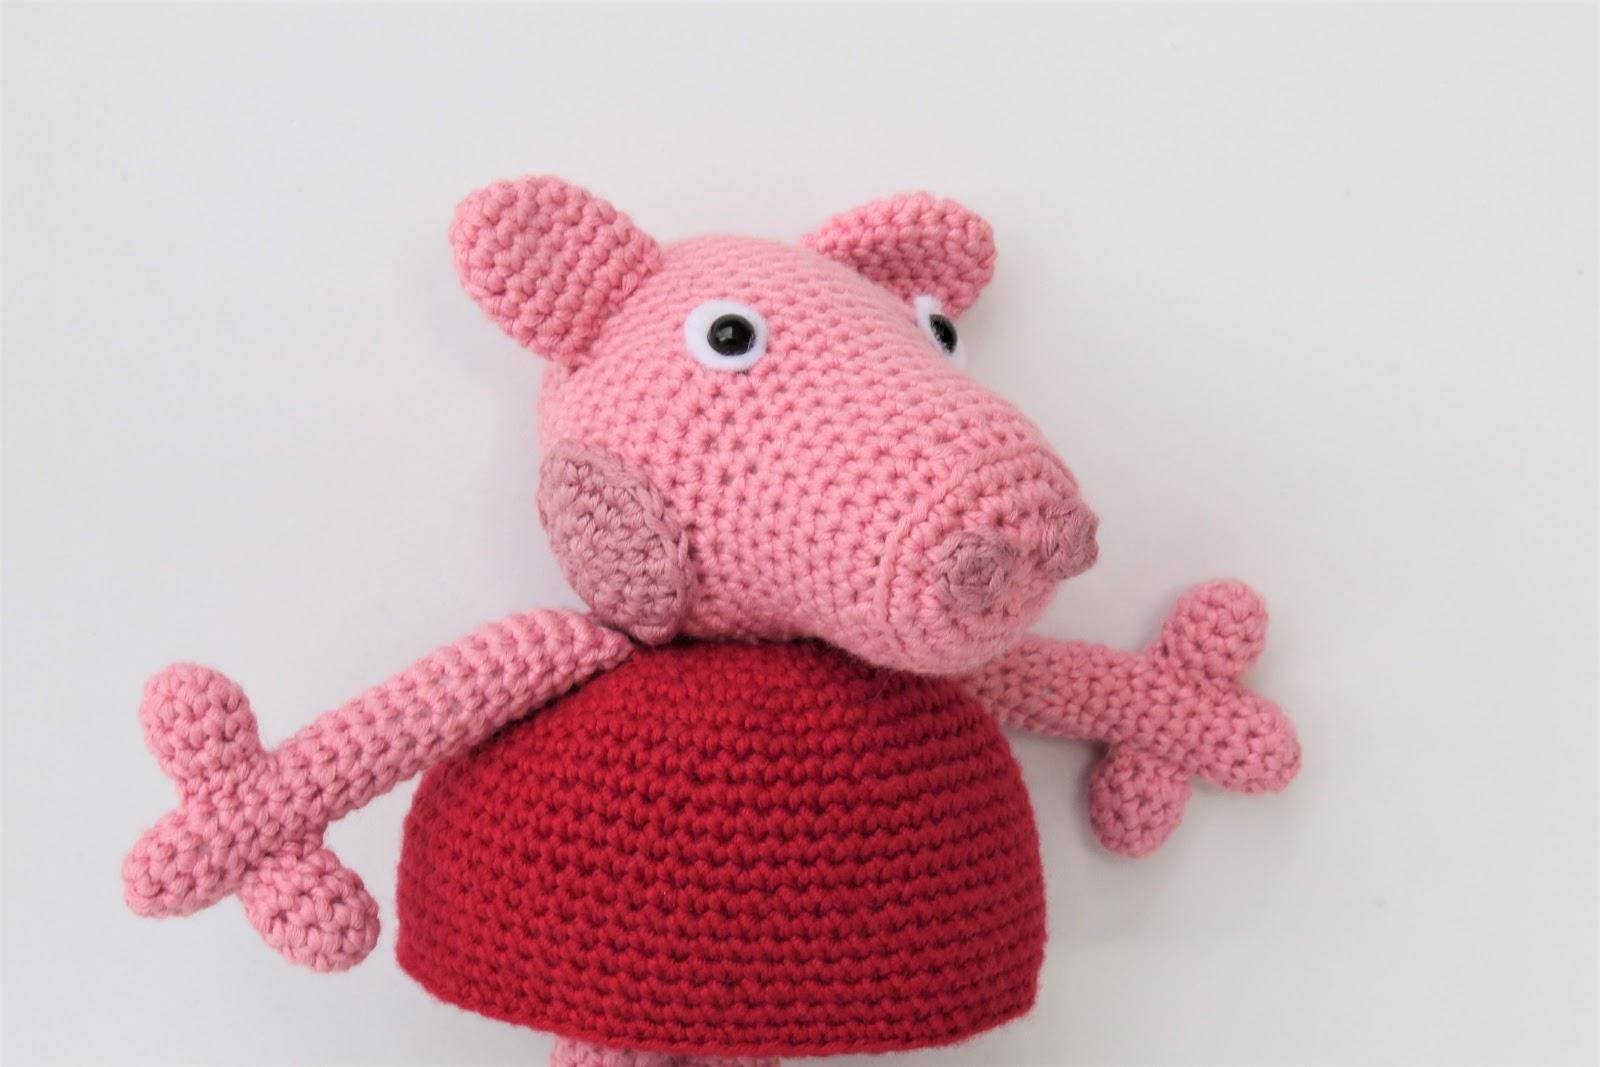 Free Amigurumi Patterns Star Wars : matemo: Peppa Pig amigurumi